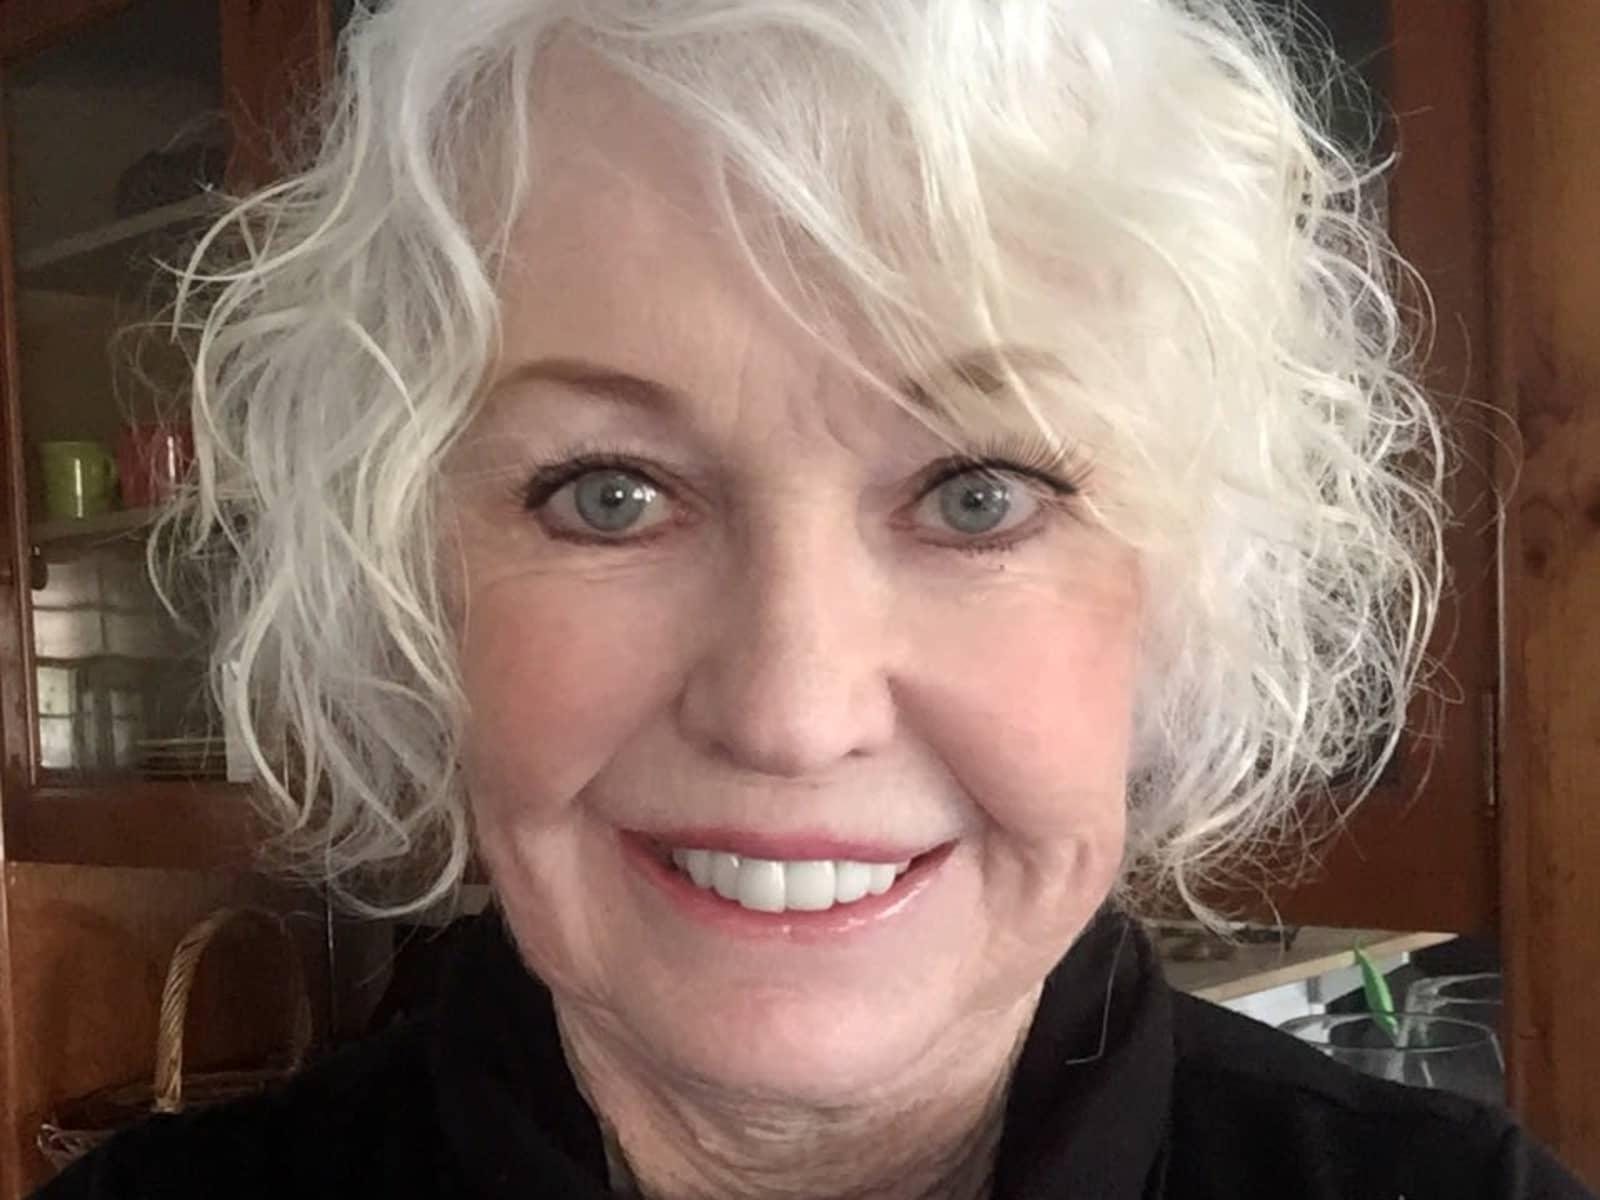 Linda from Medford, Oregon, United States